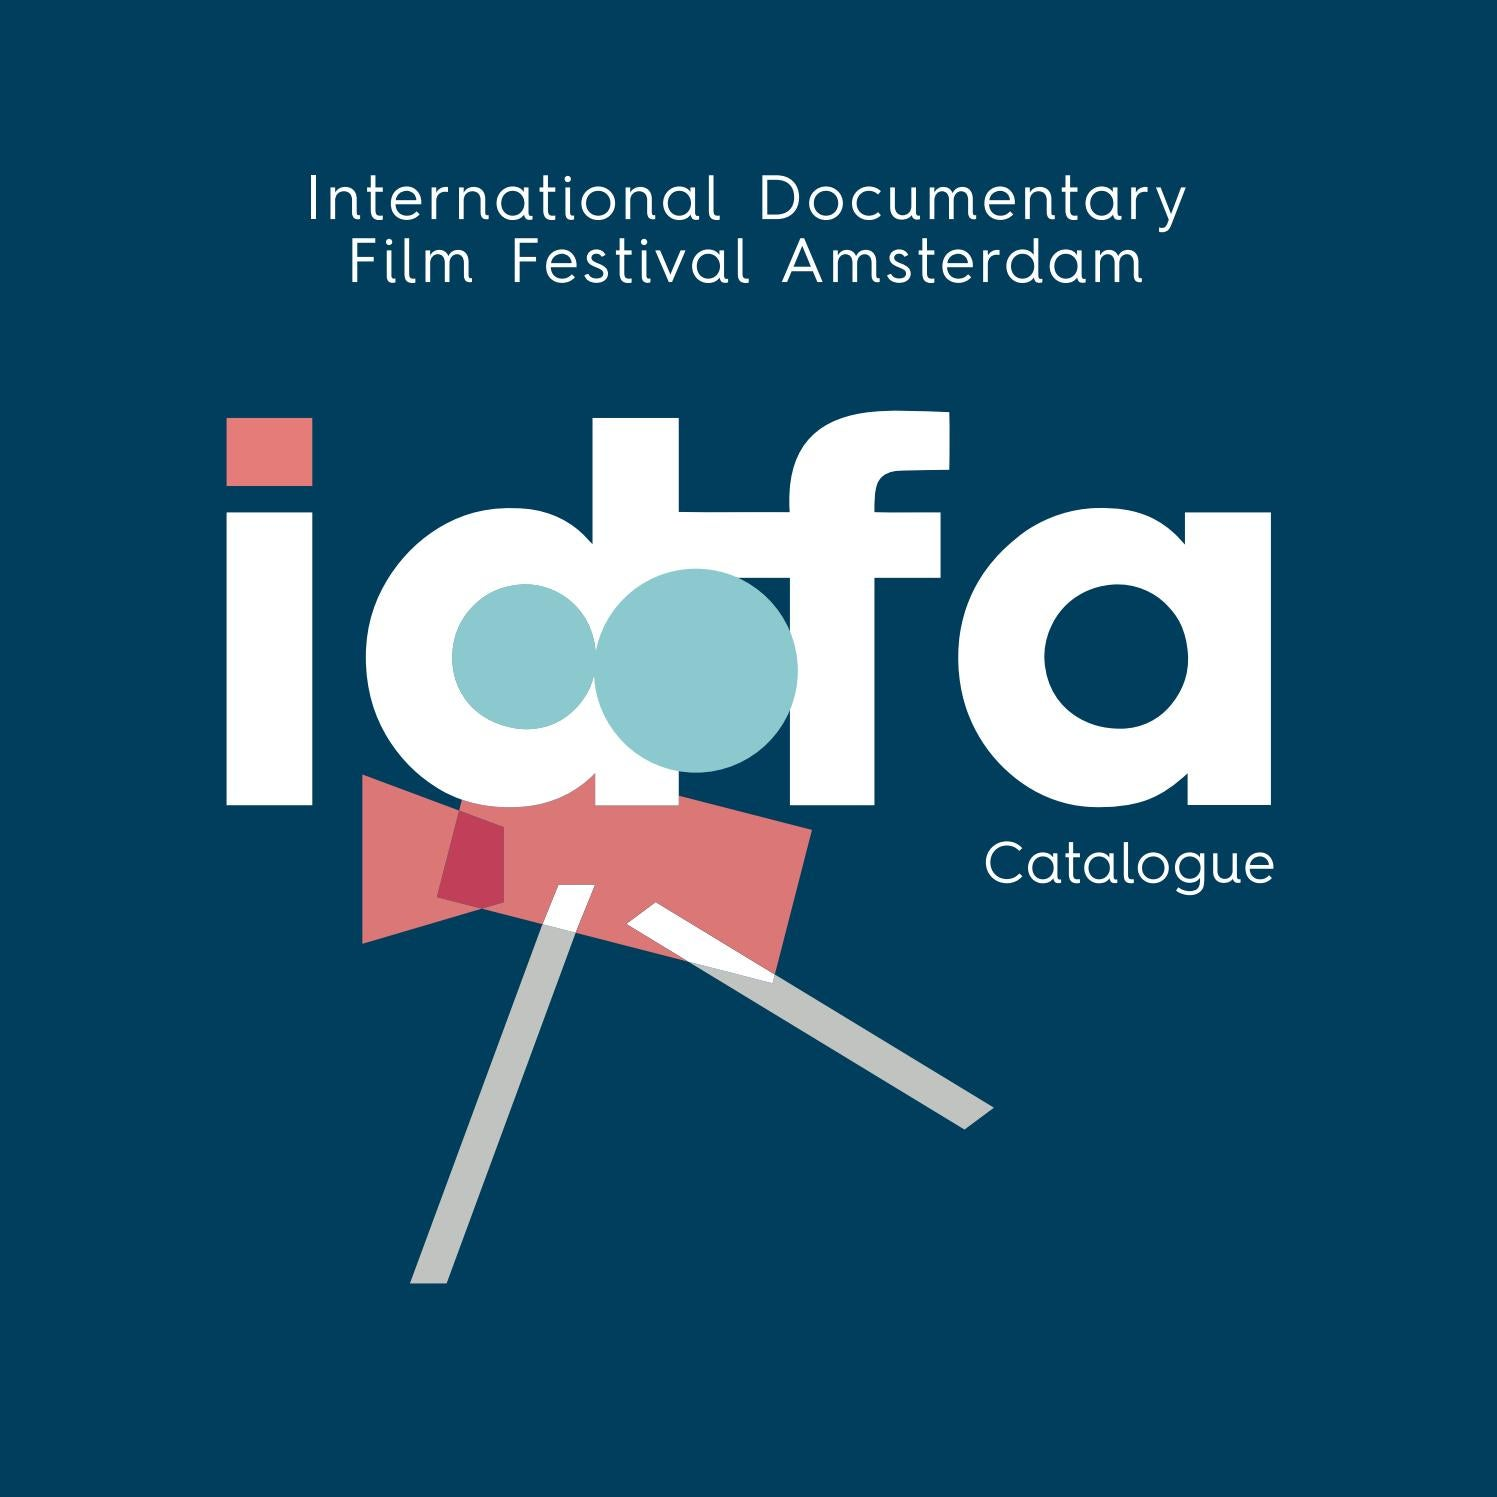 hight resolution of idfa 2016 catalogue by idfa international documentary film festival amsterdam issuu